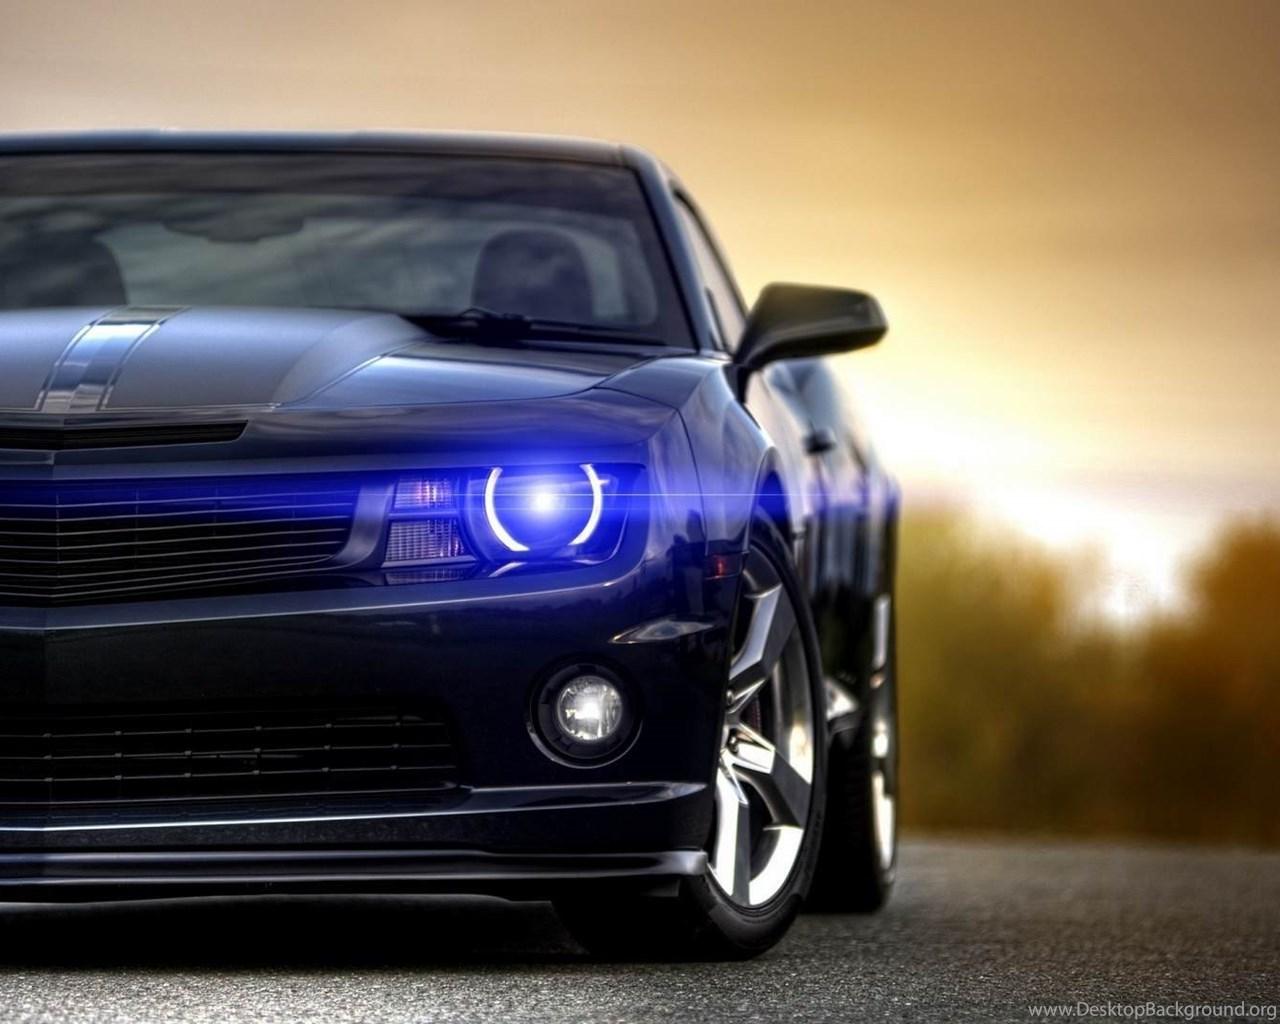 Chevrolet Camaro Wallpapers Hd Free Download Desktop Background